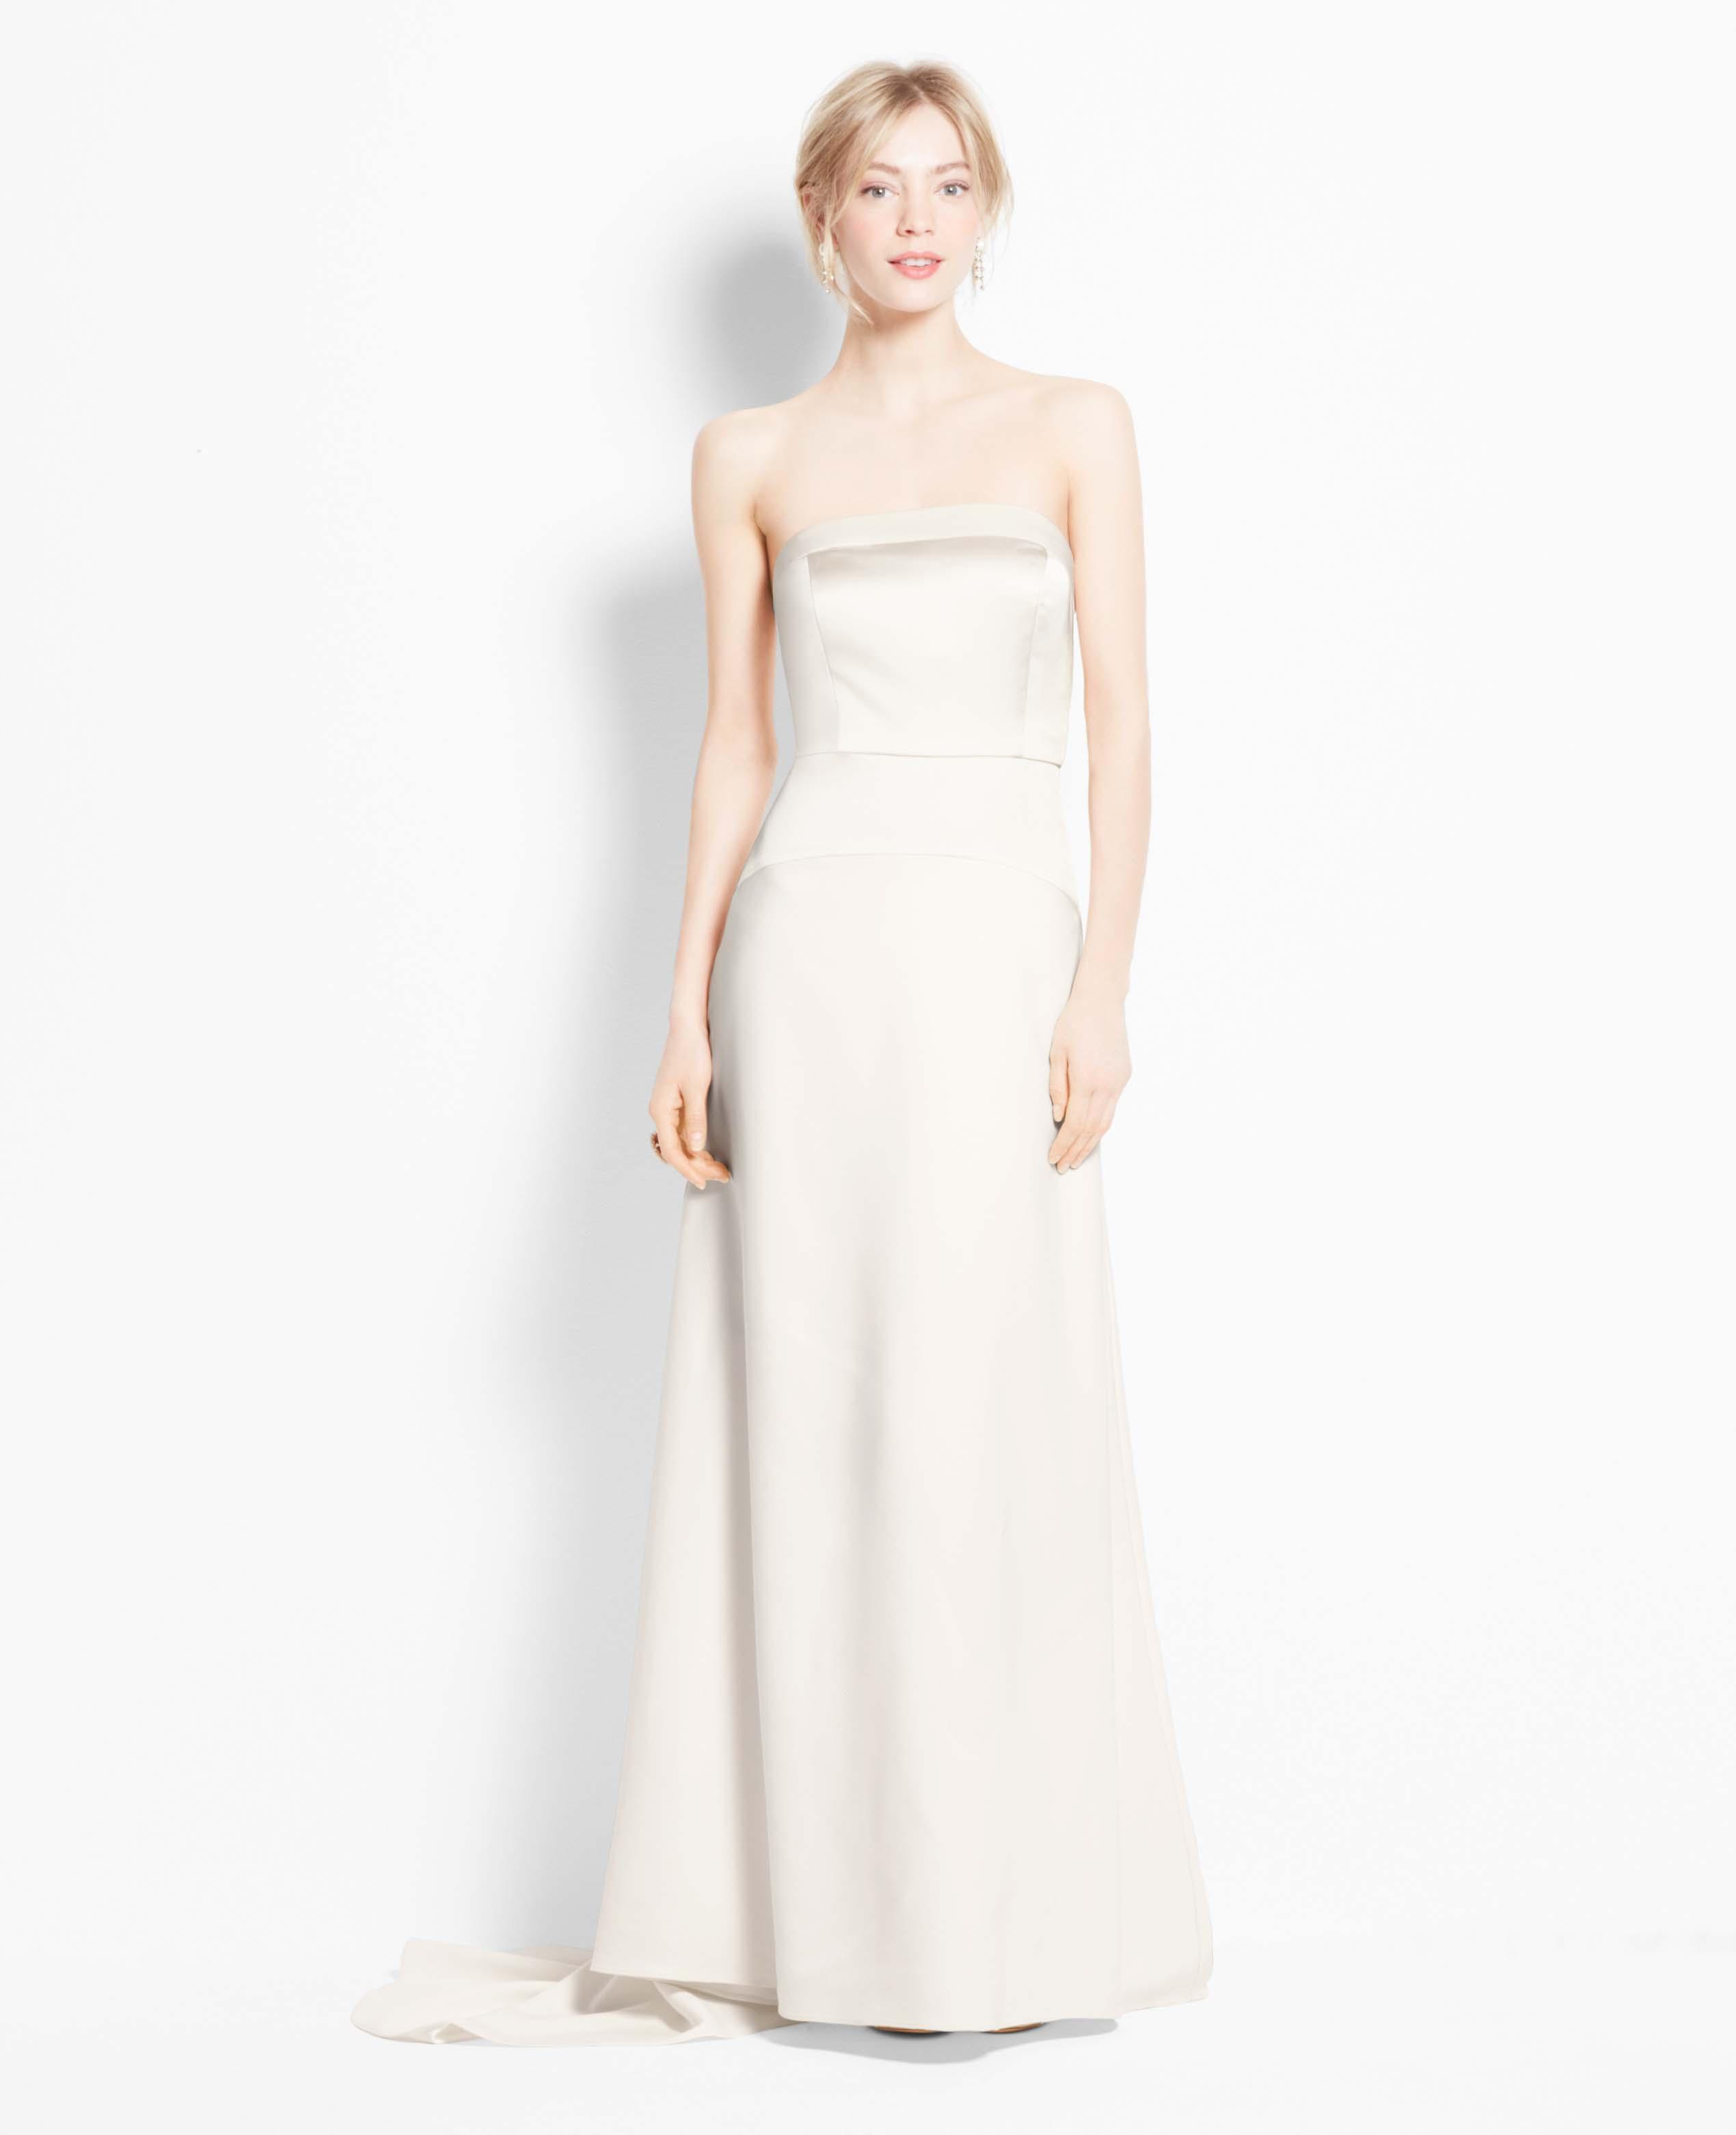 Ann taylor petite satin bodice strapless wedding dress in white lyst gallery junglespirit Choice Image